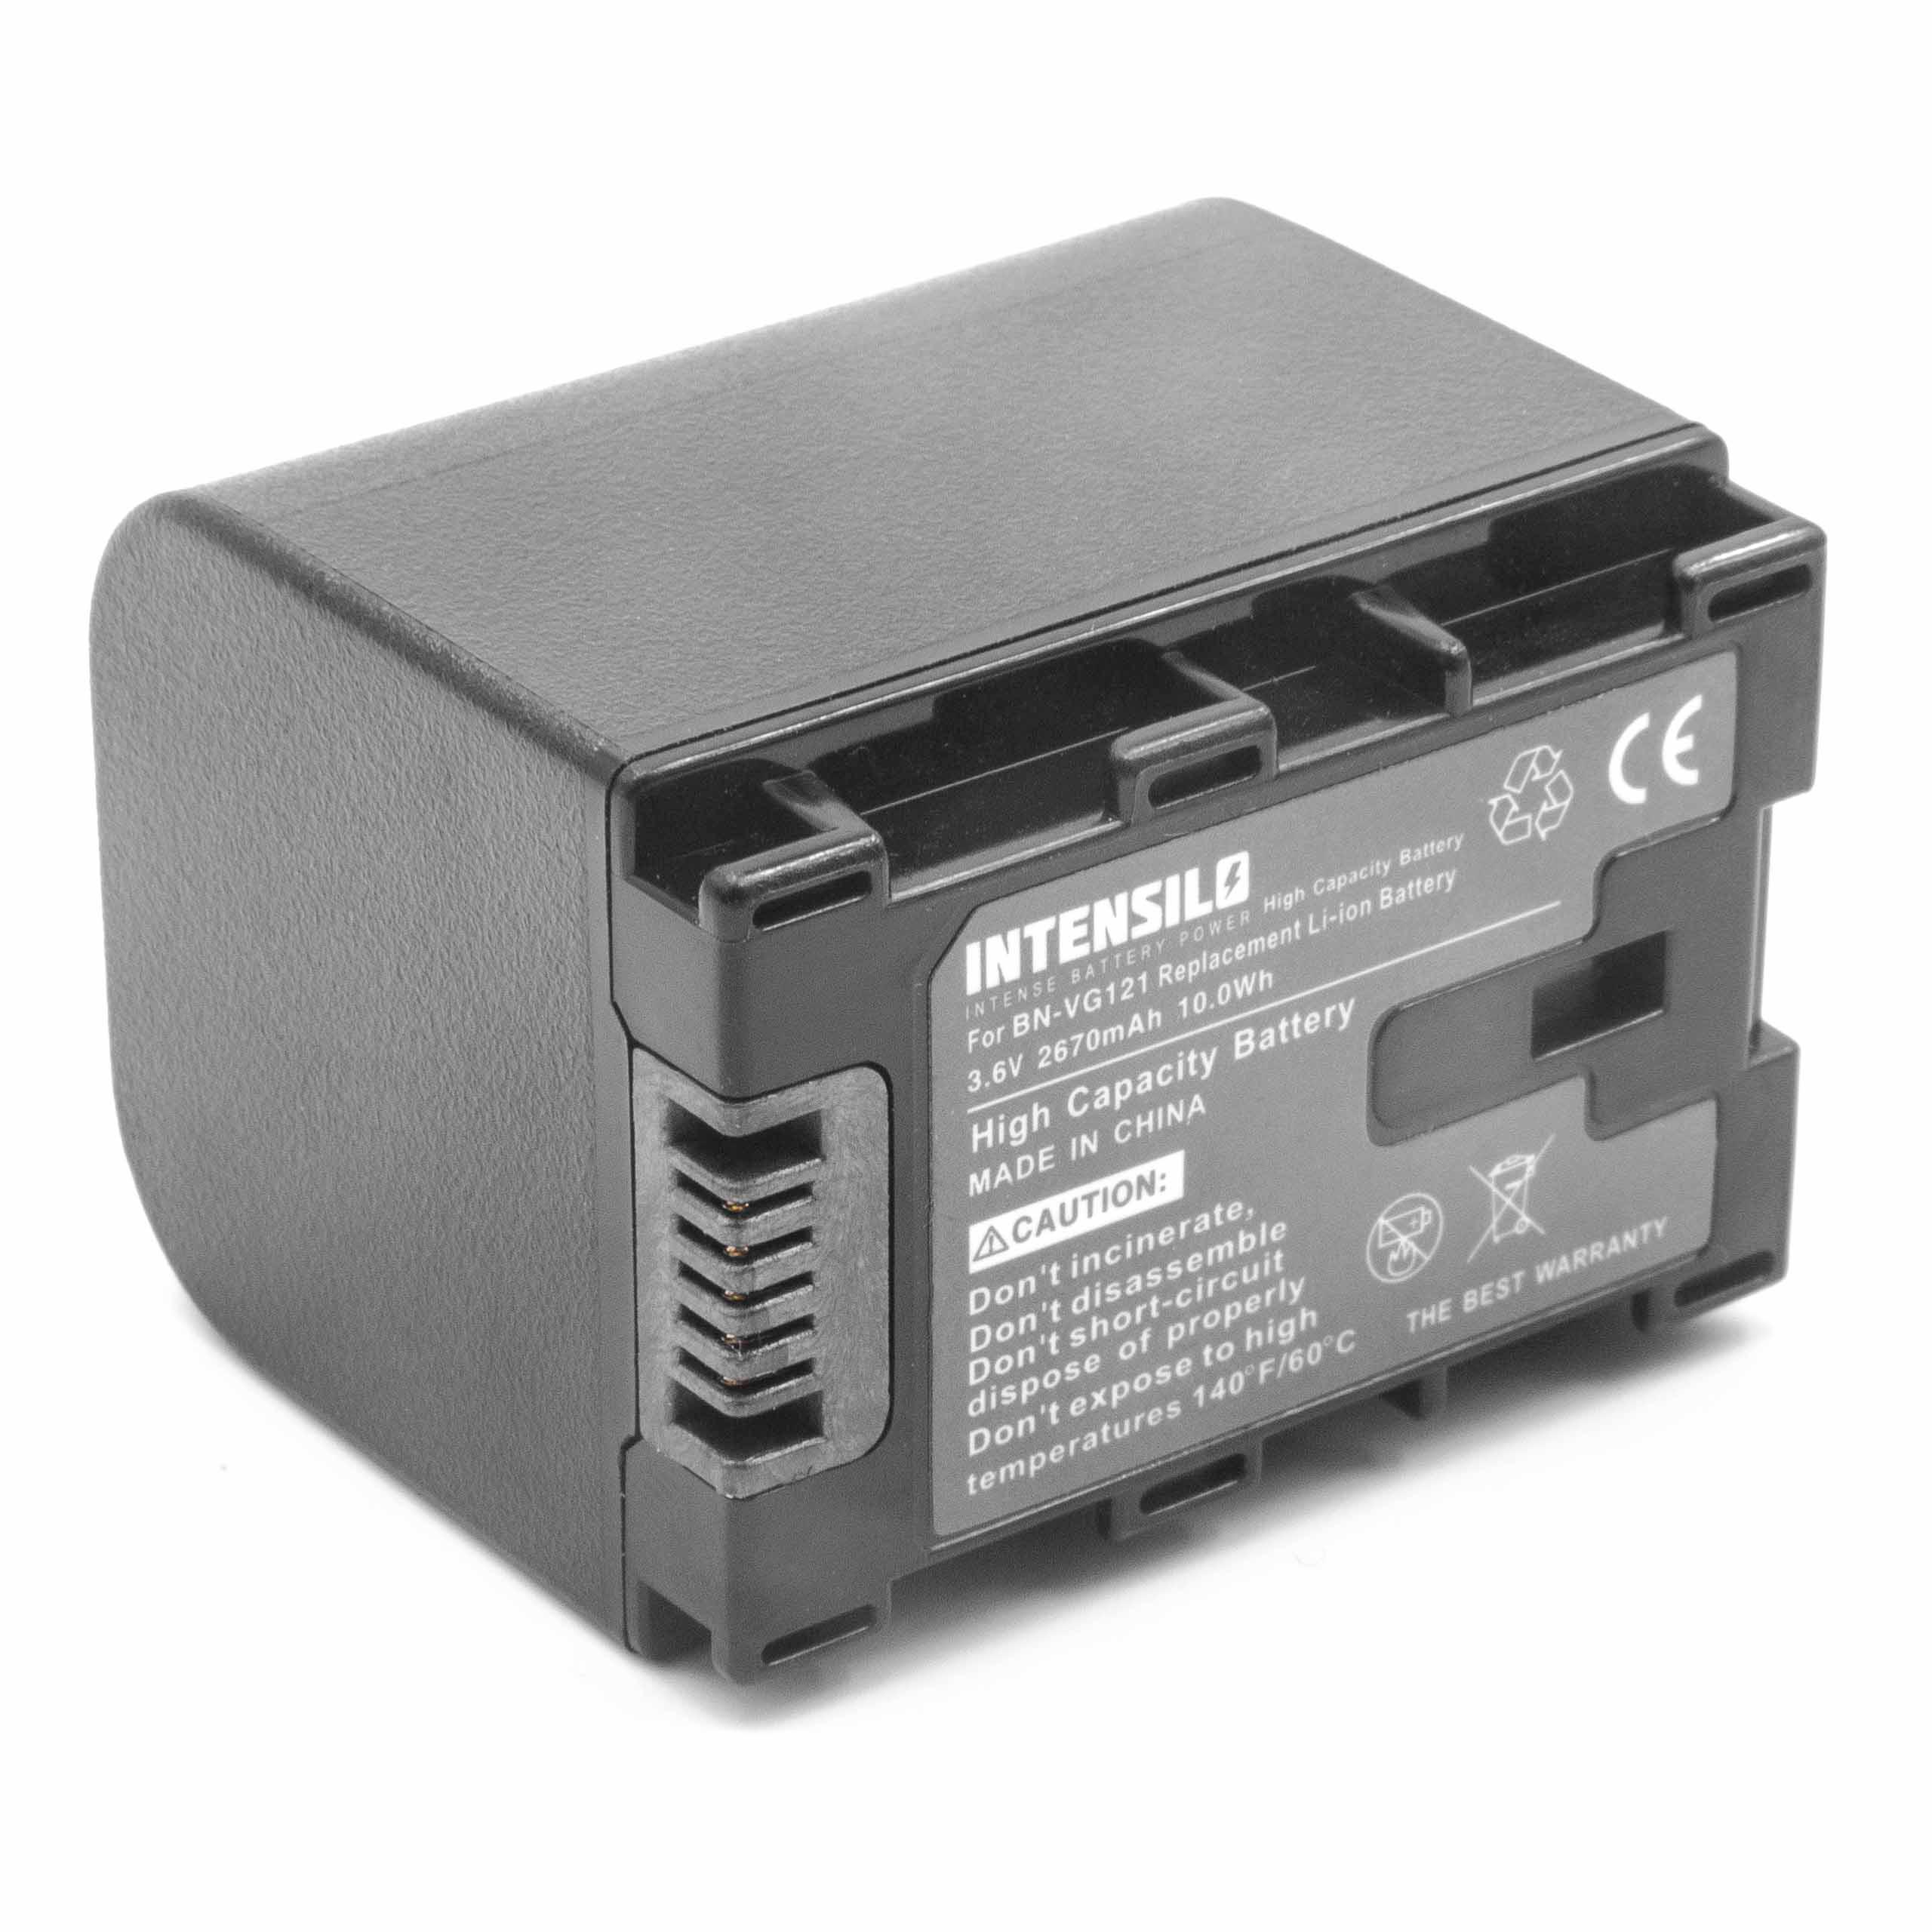 AKKU LADEGERÄT MICRO USB für GZ-MS215 GZ-MS215SEU GZ-MS215PEU